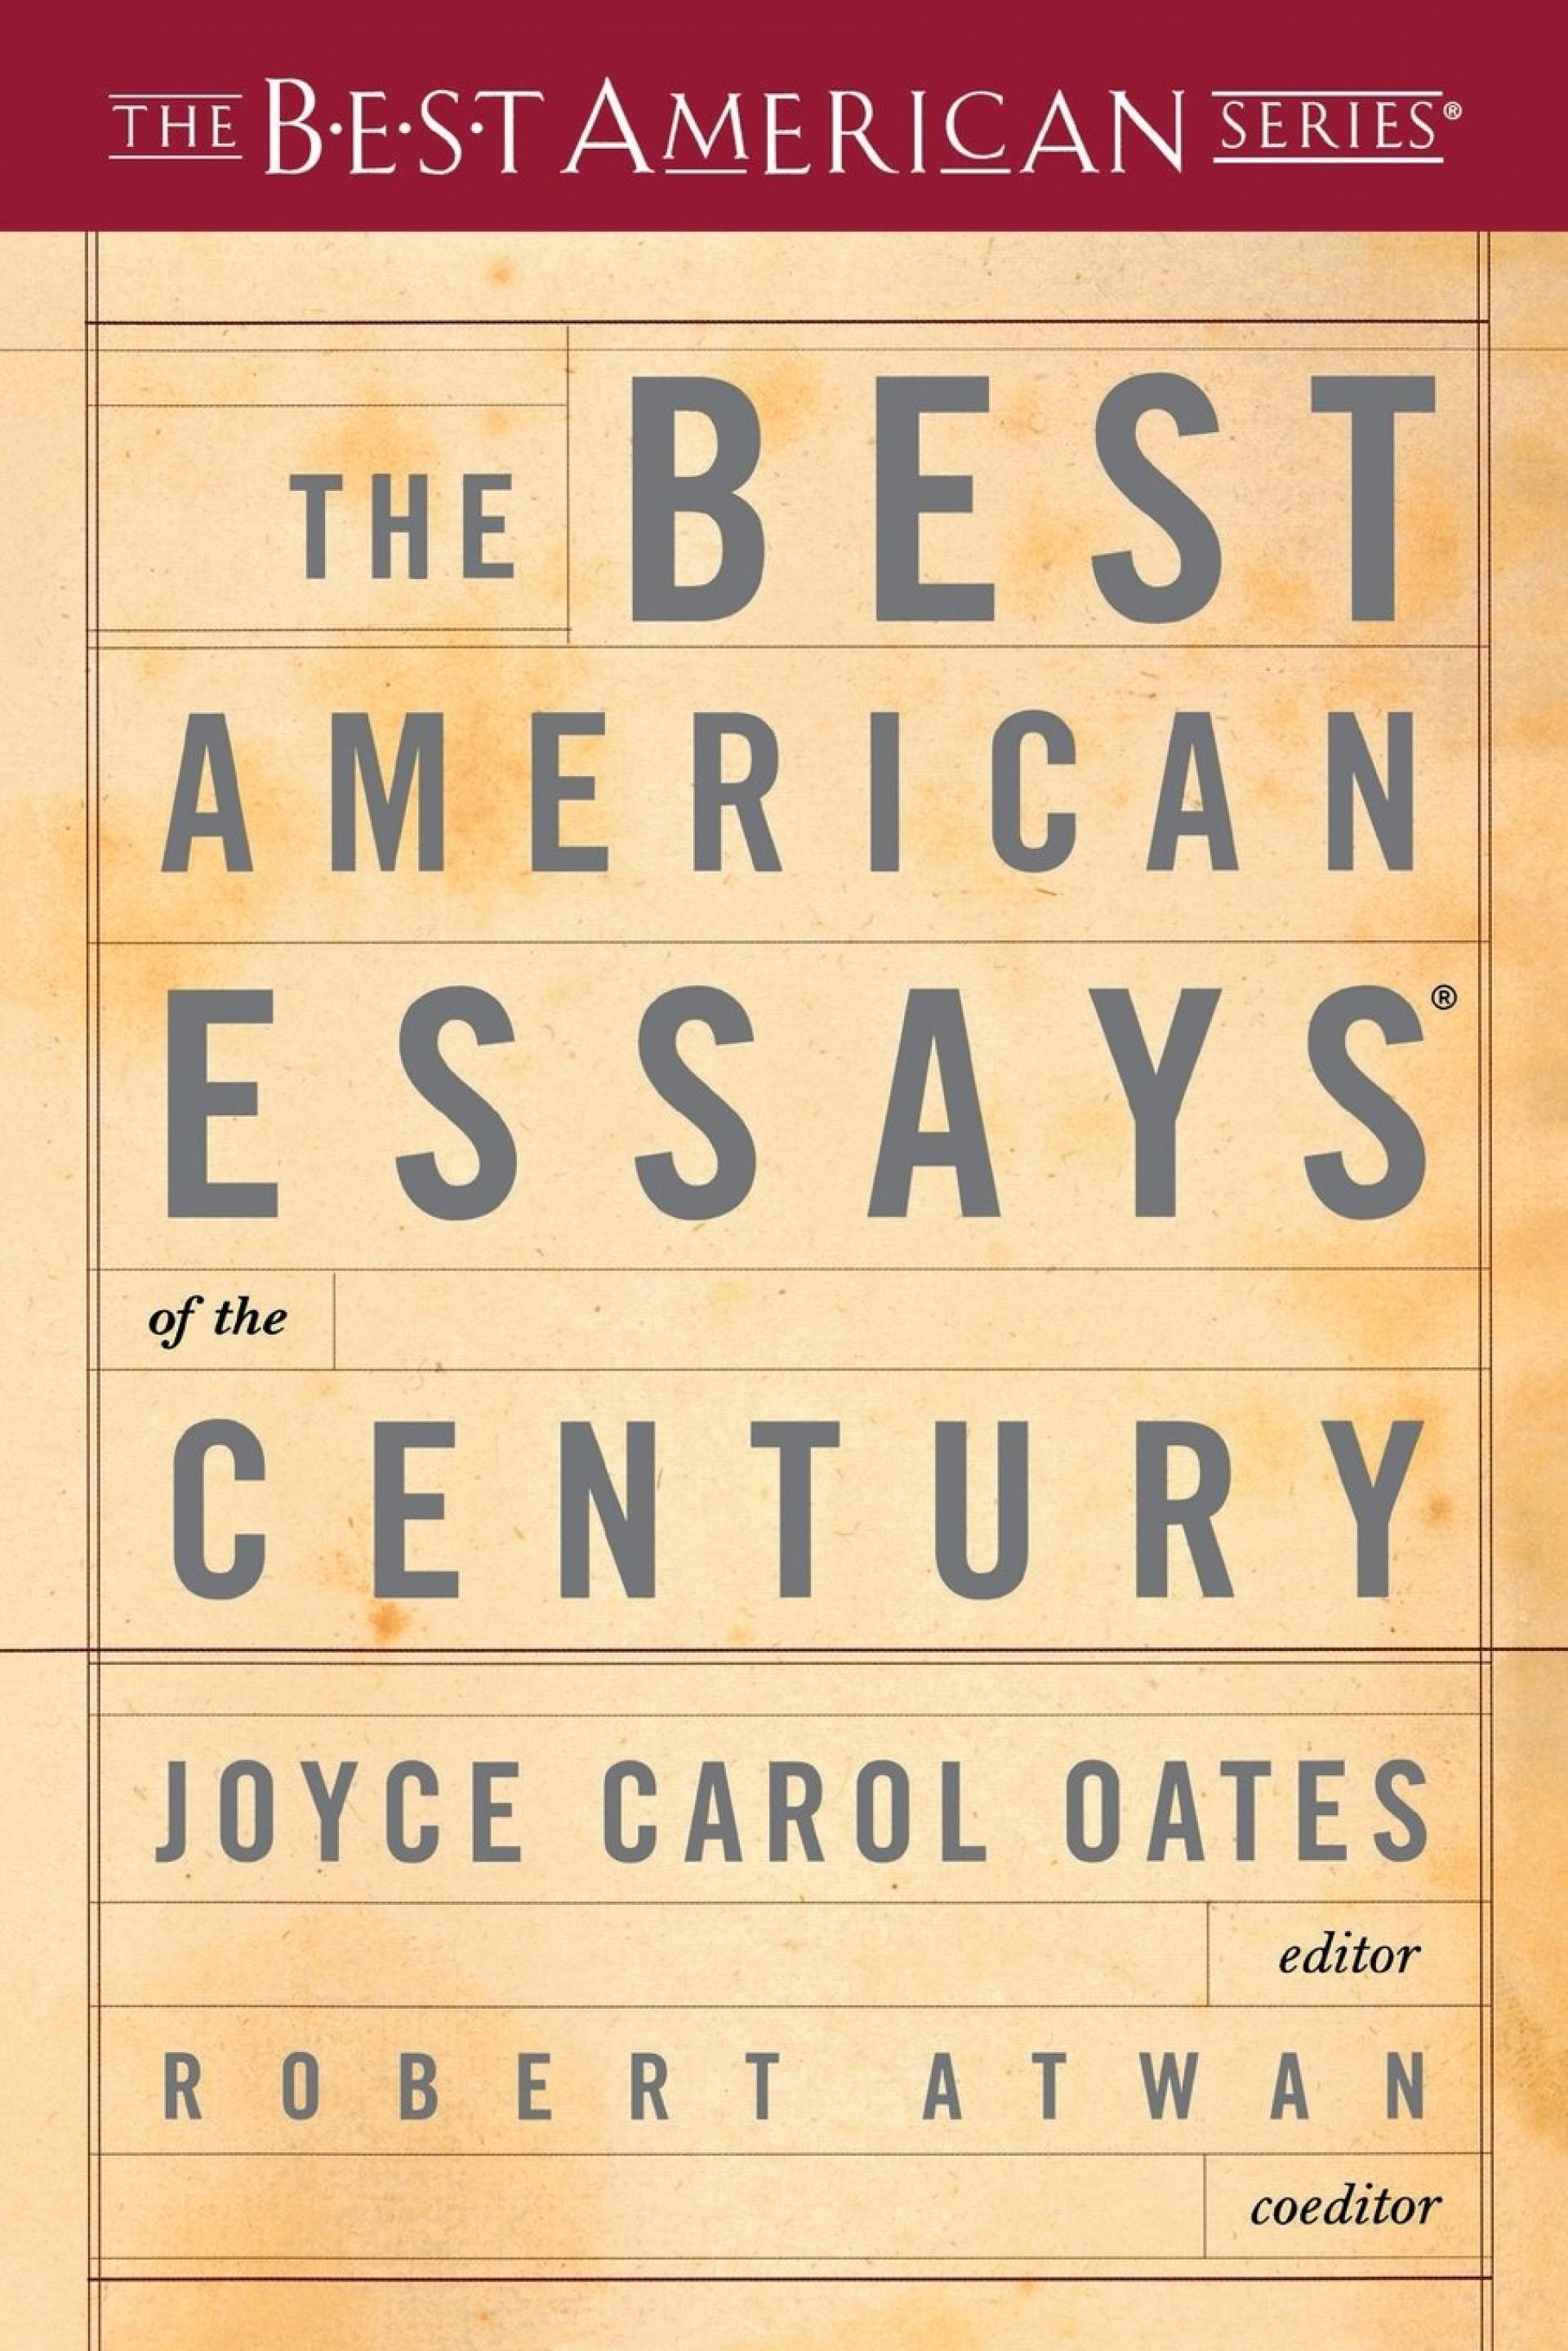 010 71qut2nc4kl American Essay Striking Topics Titles Format 1920